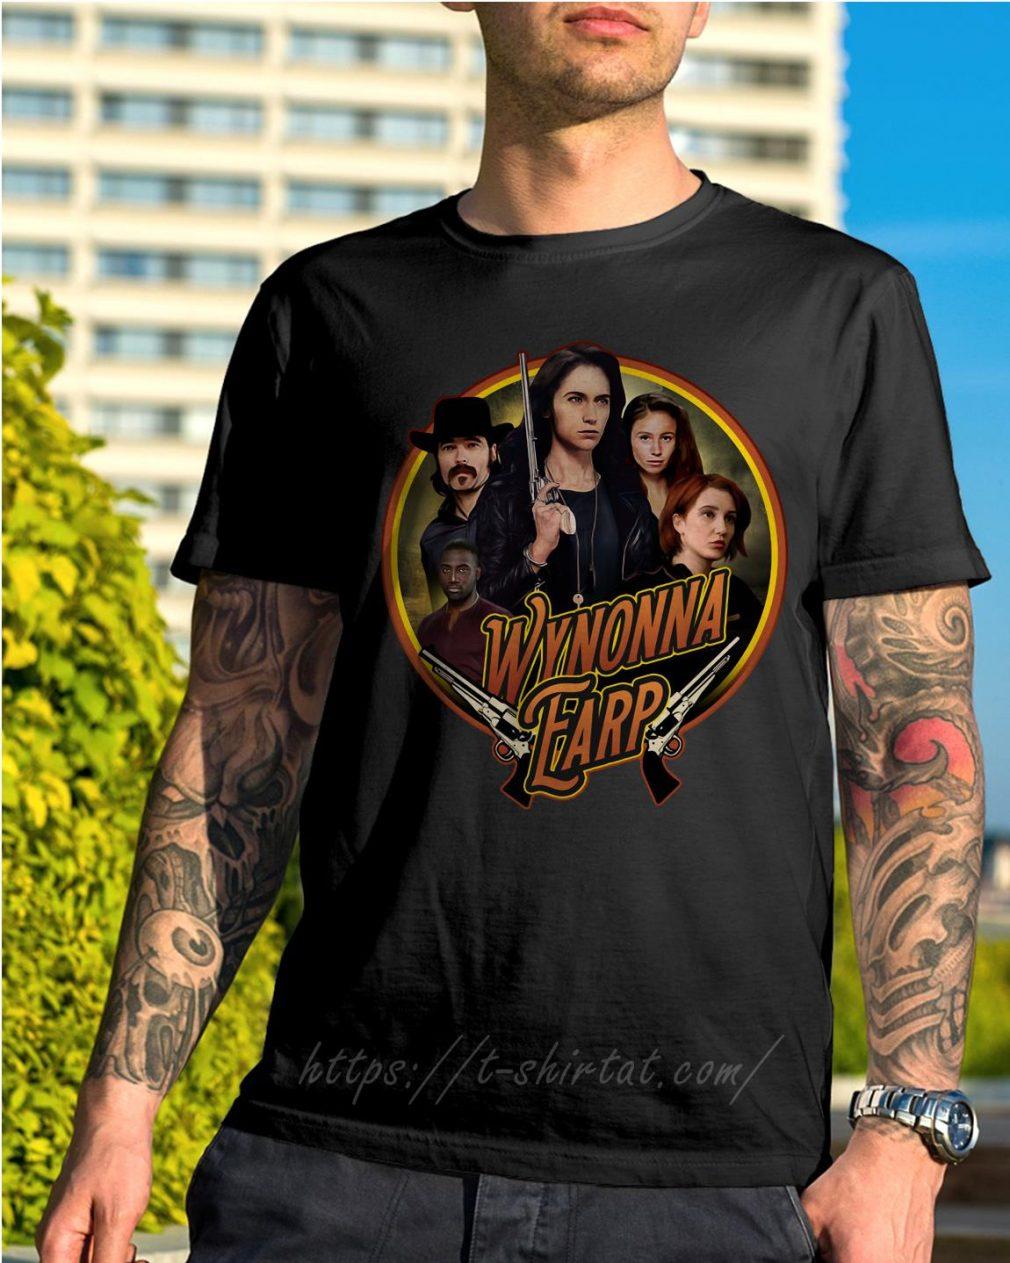 Official Wynonna Earp shirt